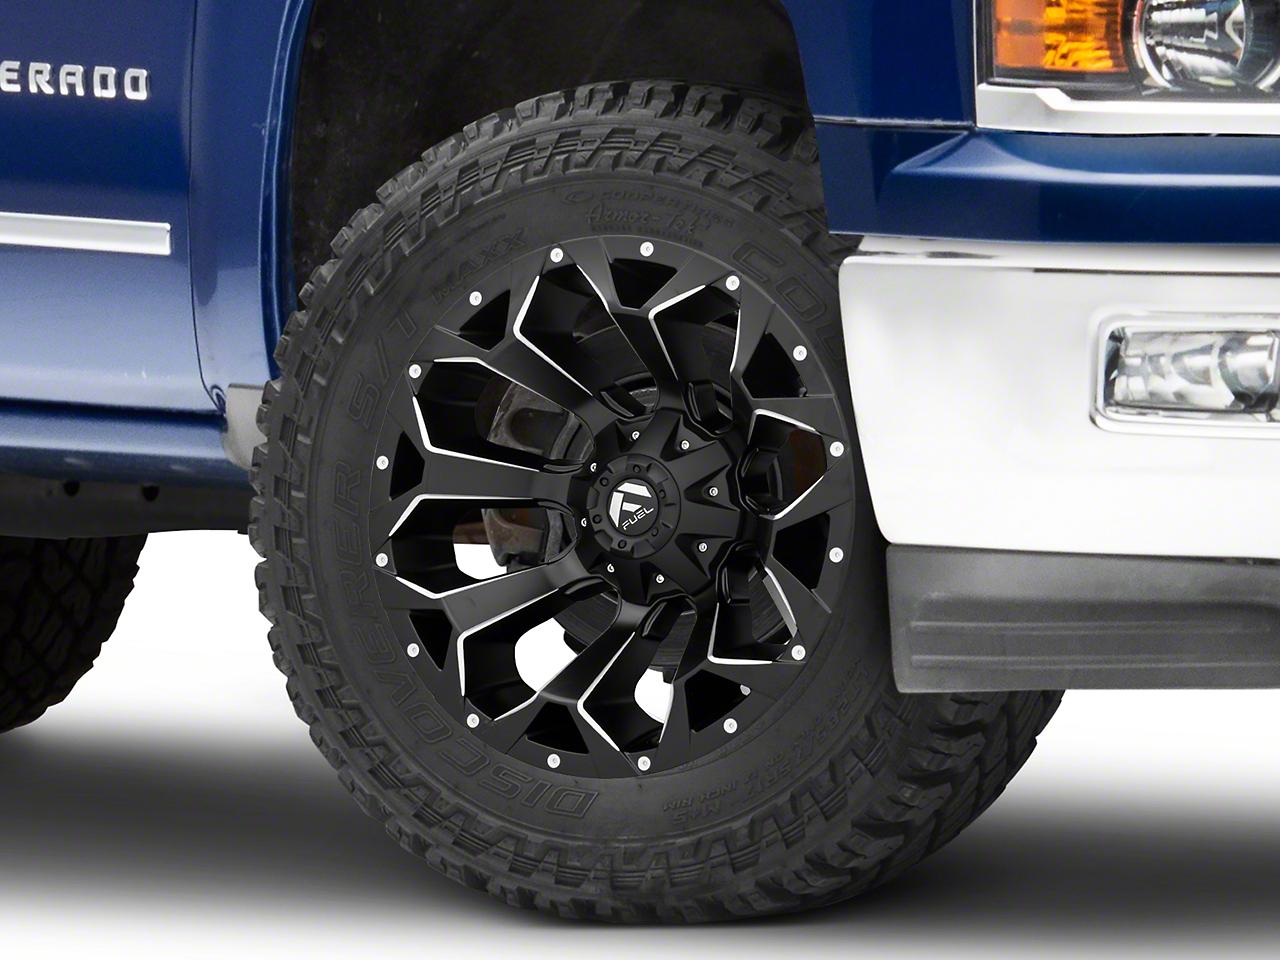 Fuel Wheels Assault Black Milled 6-Lug Wheel - 20x10 (99-18 Silverado 1500)